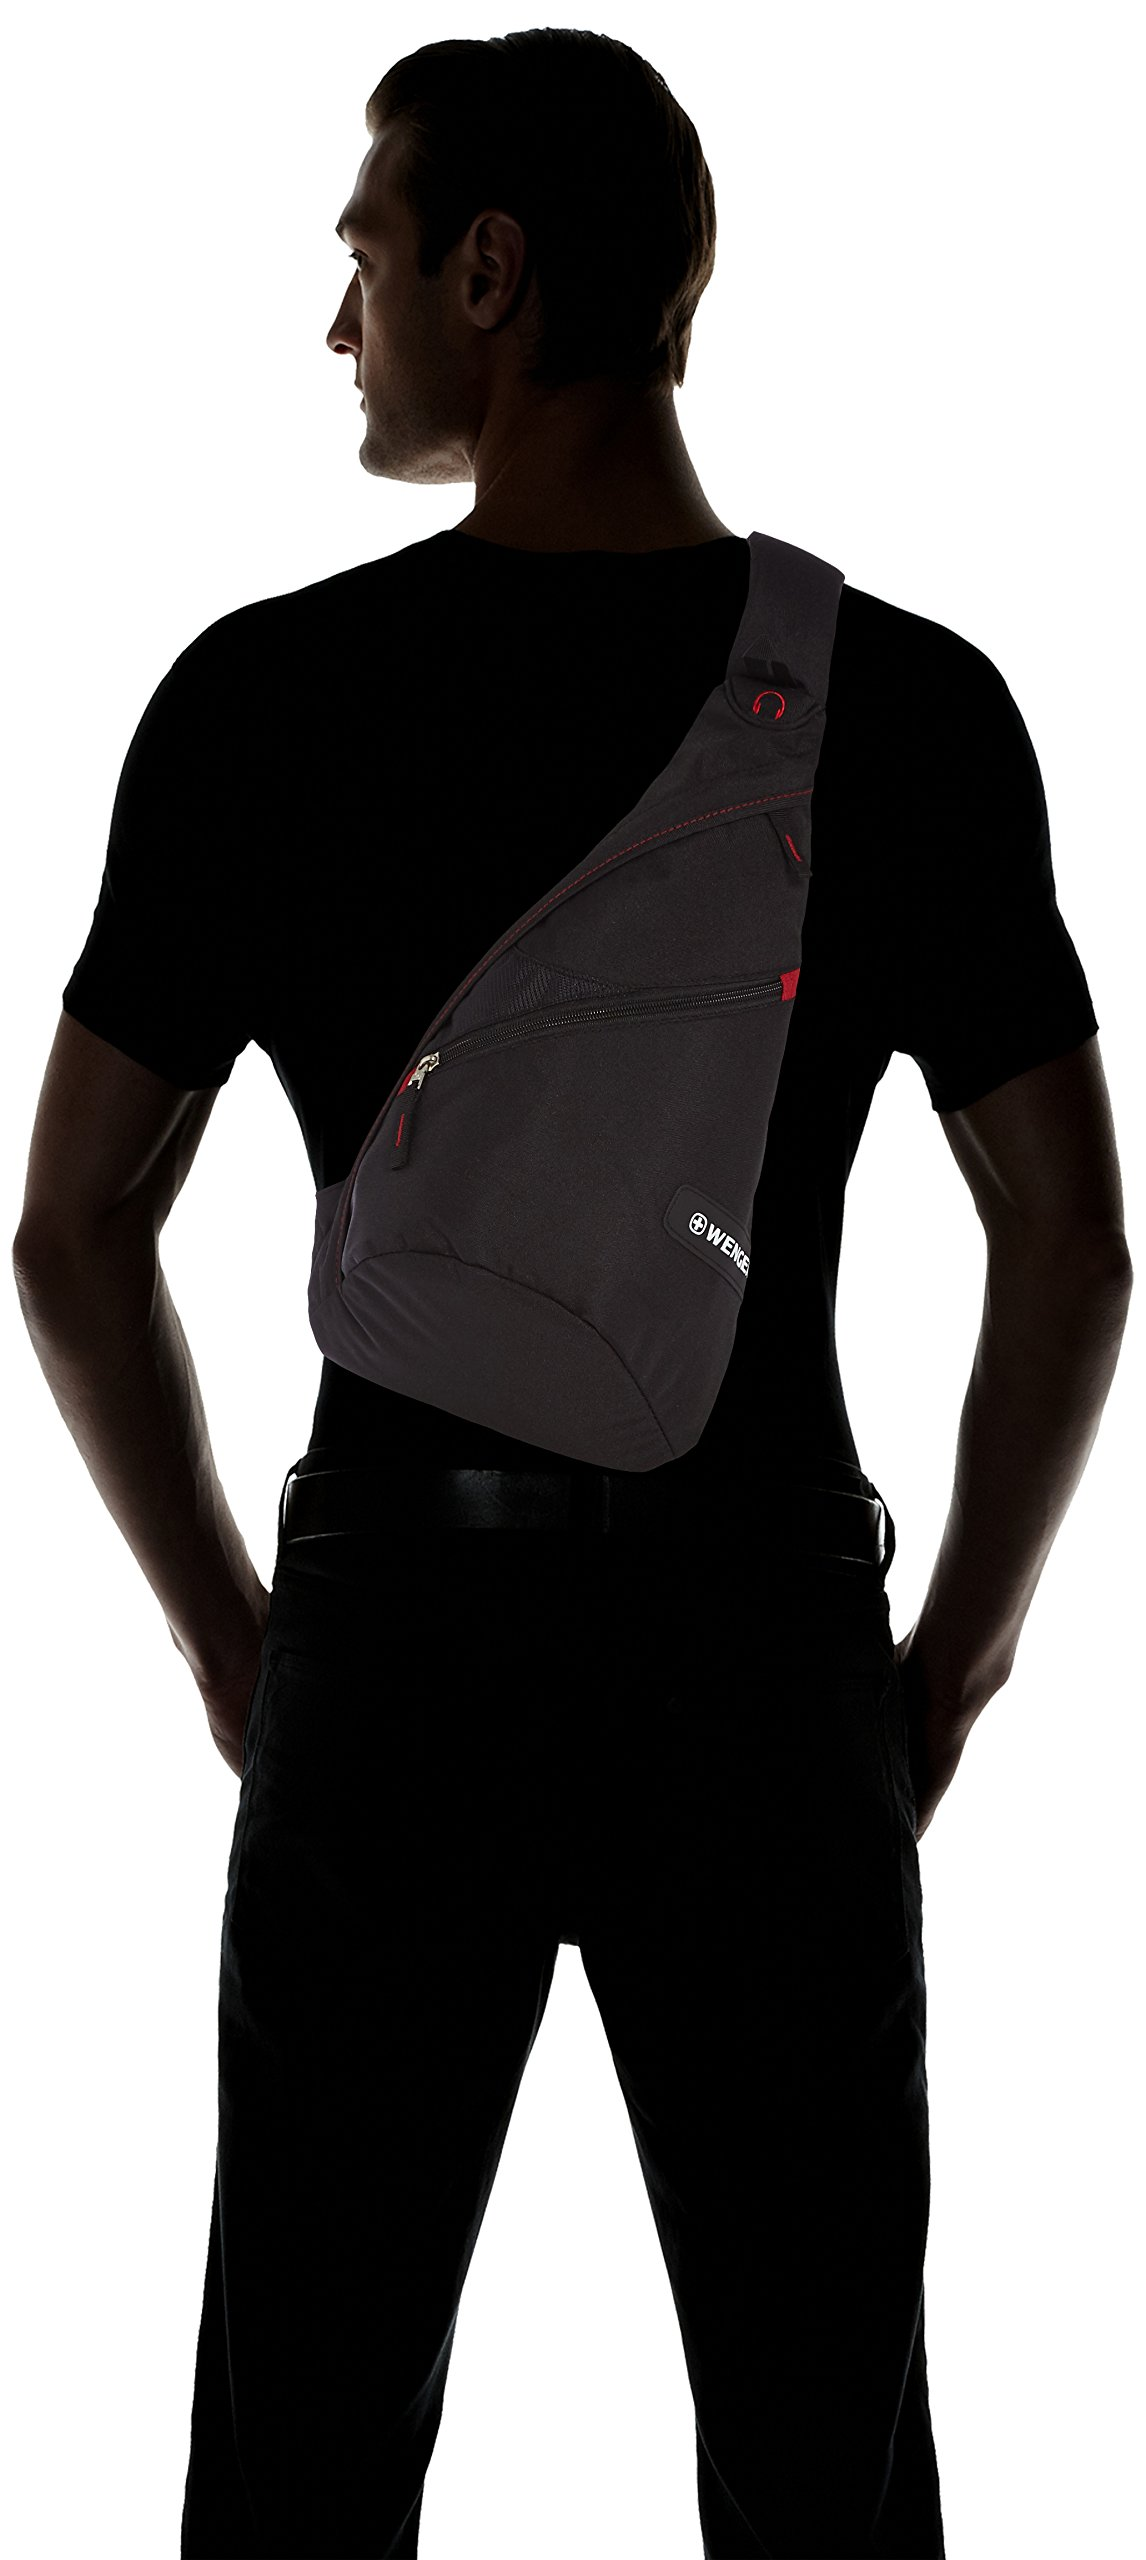 71alAdYak L - Wenger Mochila Casual, 12 litros, negro (Negro) - WG18302130